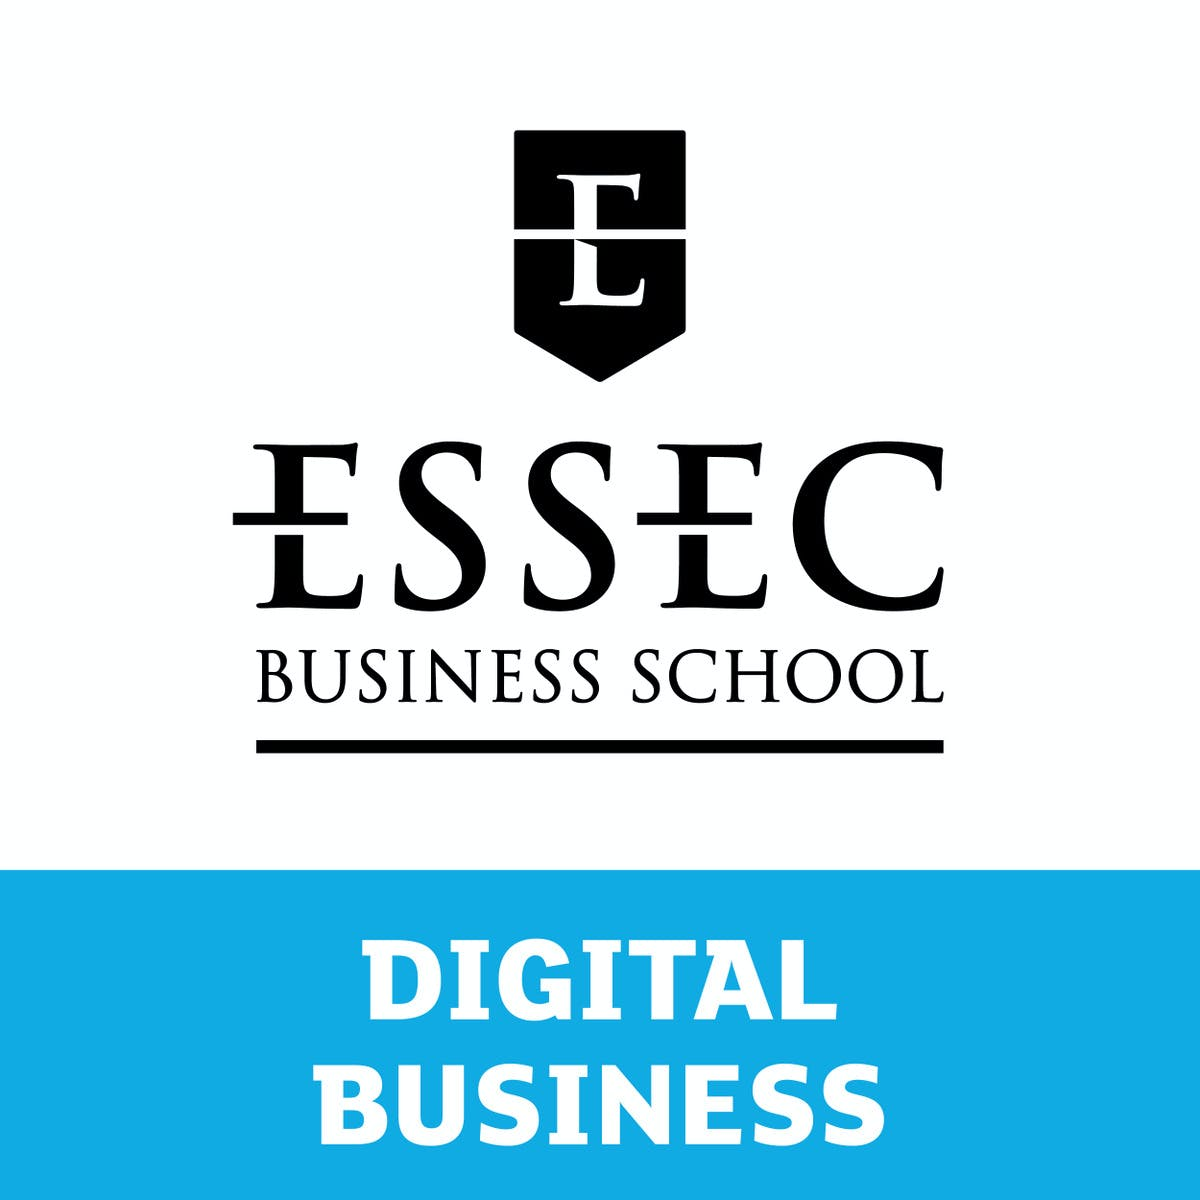 Case studies in business analytics with ACCENTURE